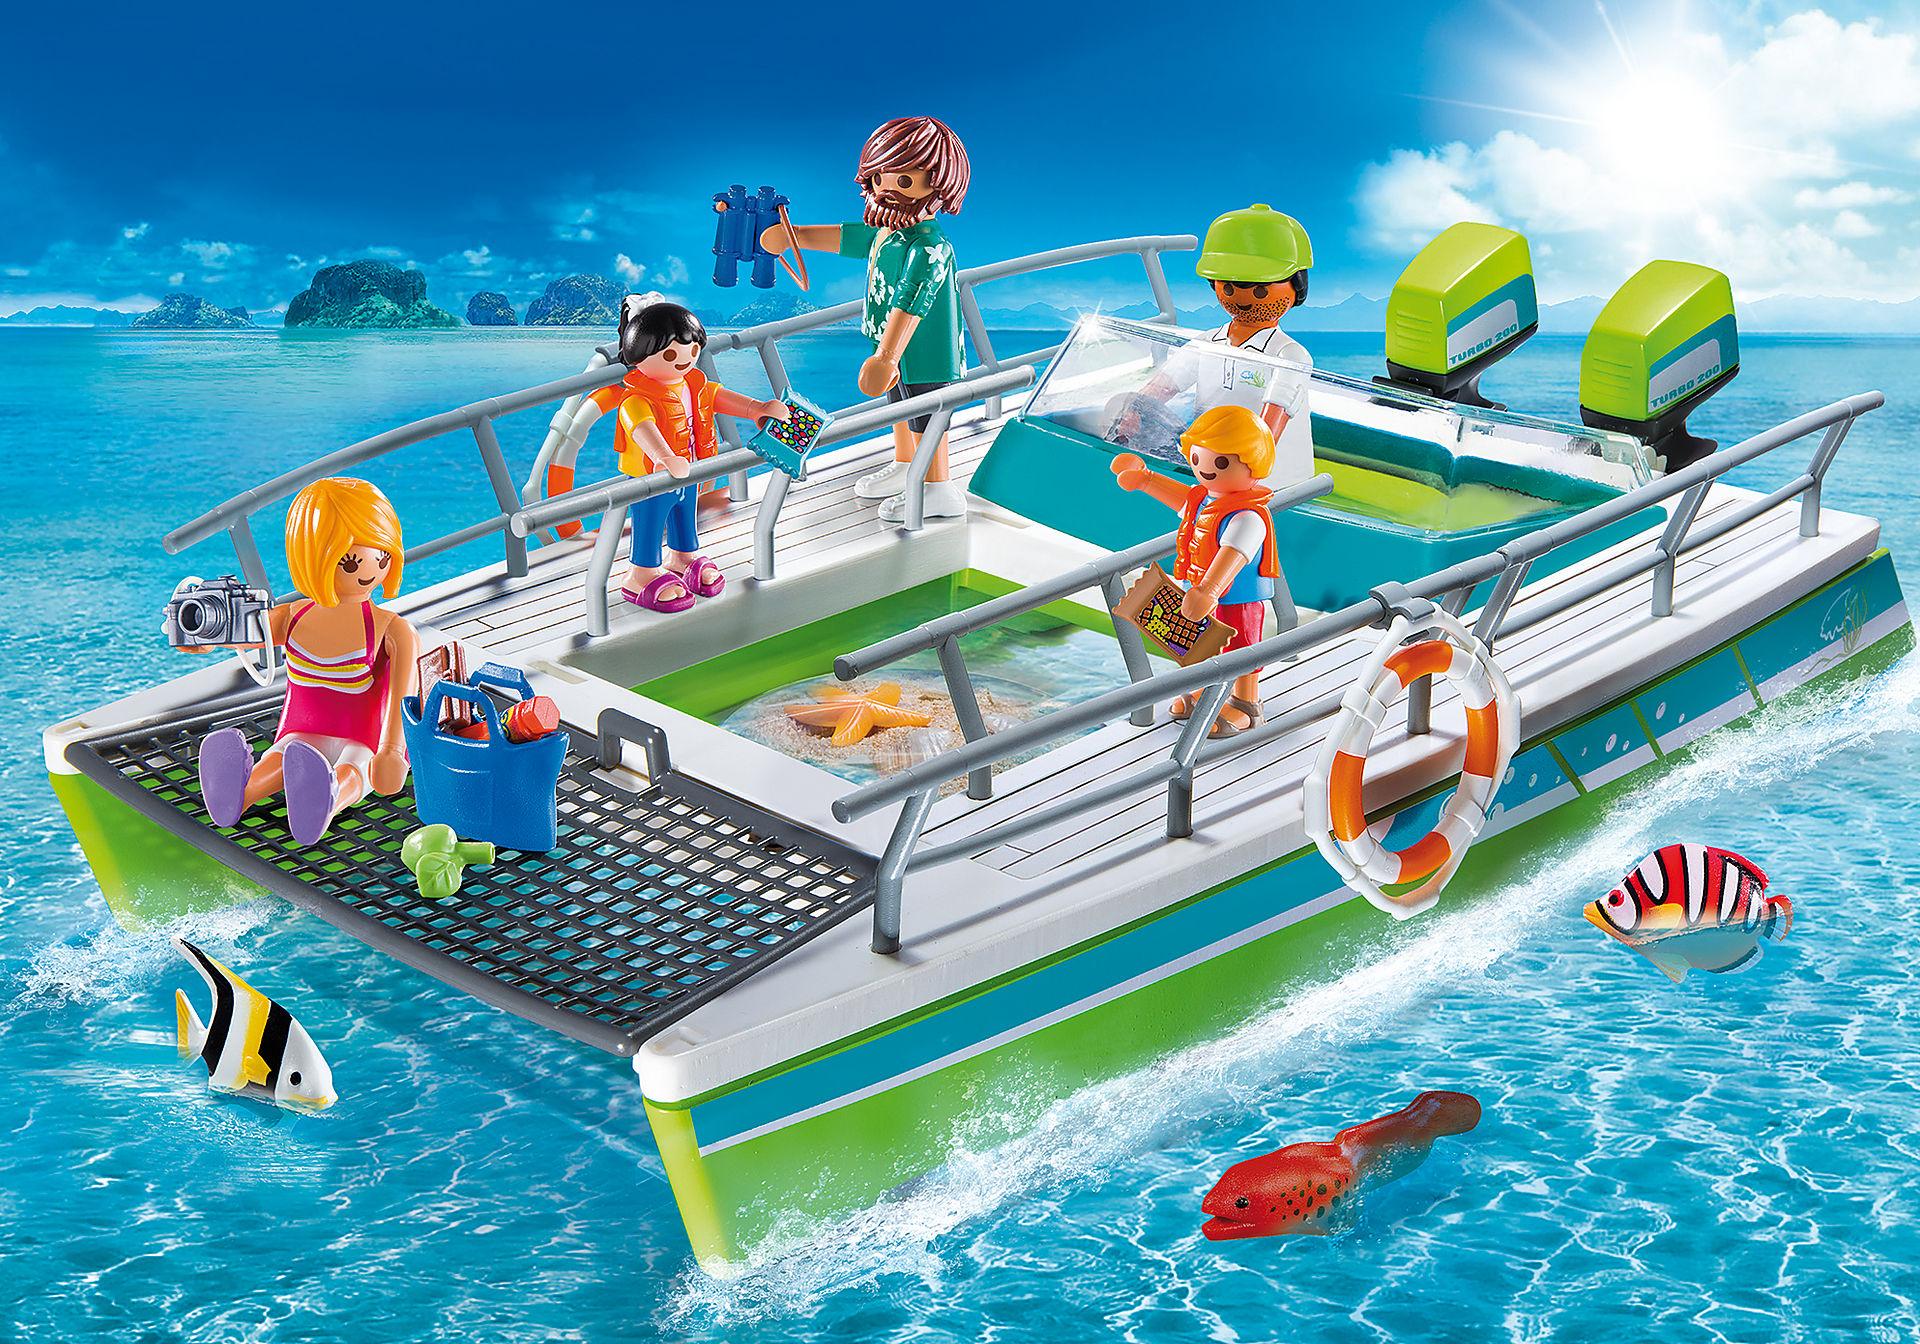 http://media.playmobil.com/i/playmobil/9233_product_detail/Barco Vistas Fondo Marino con Motor Submarino